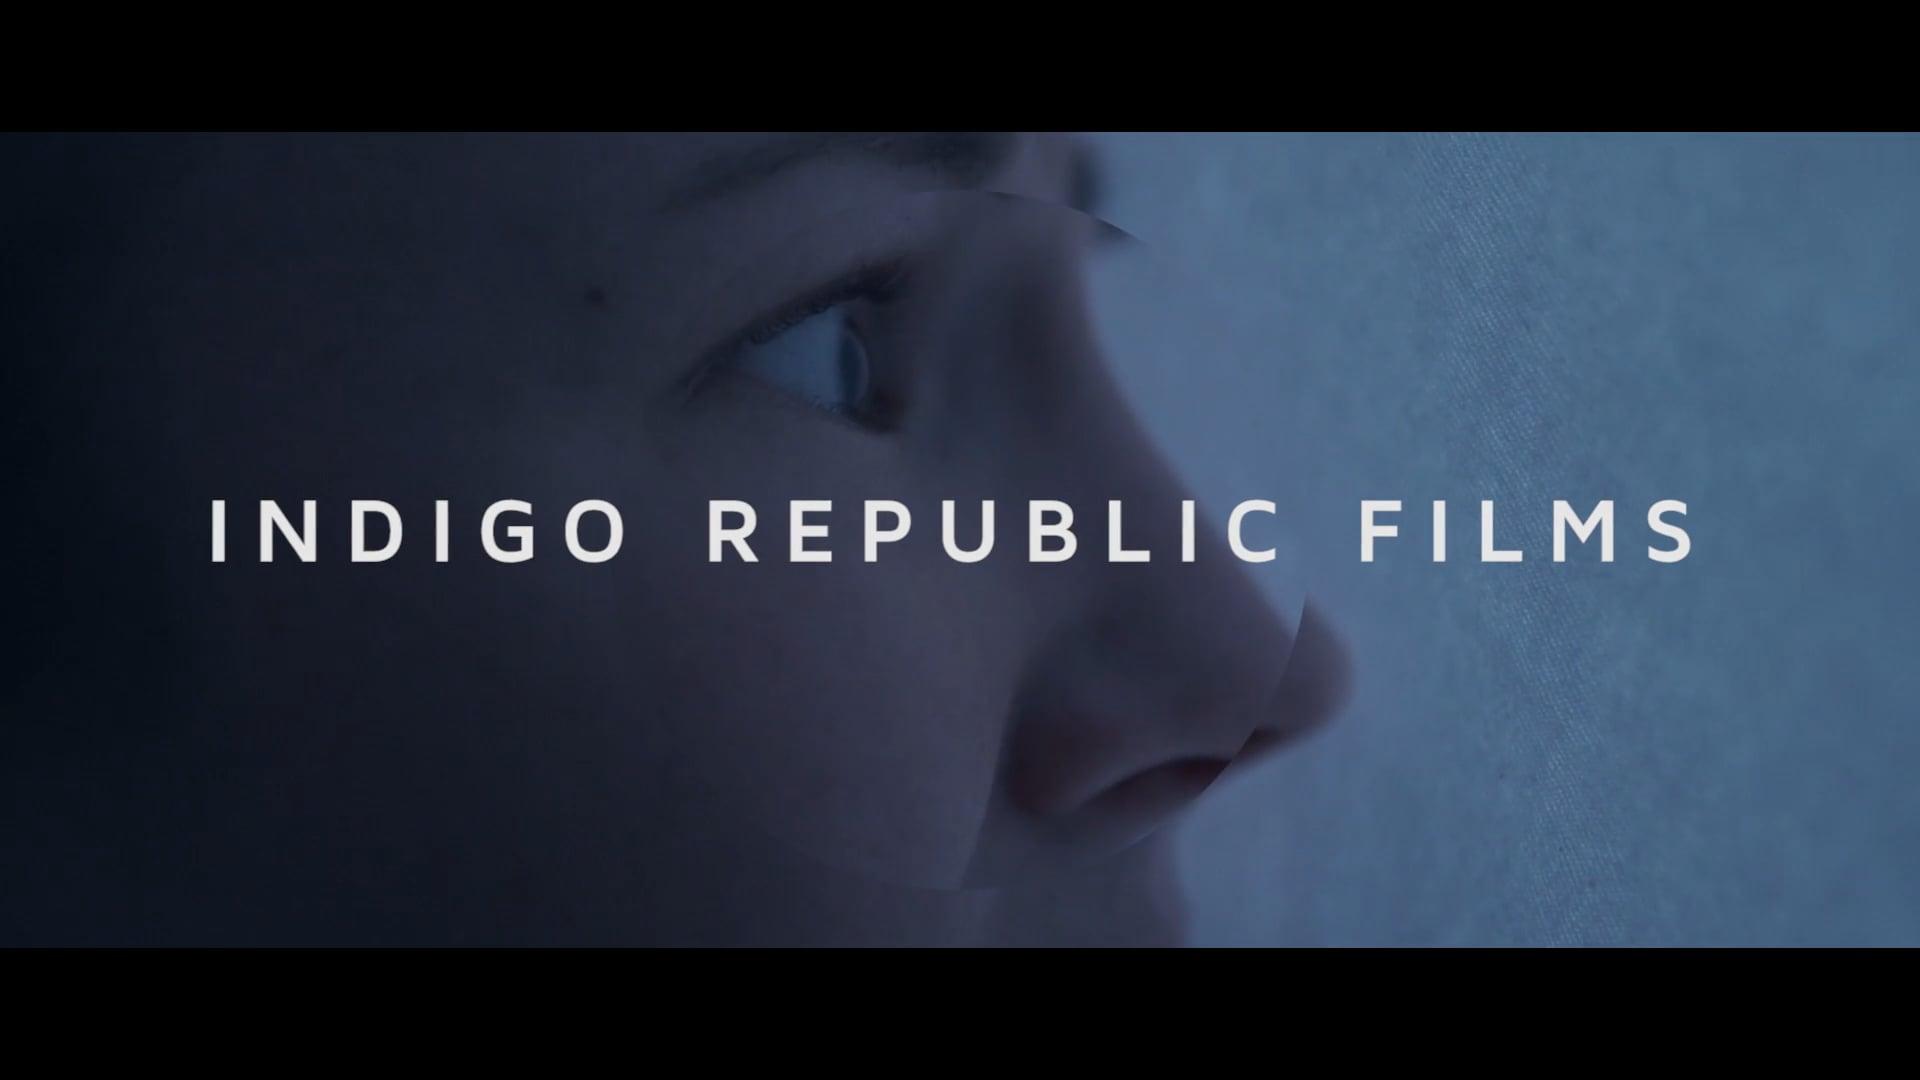 INDIGO REPUBLIC DRAMA REEL